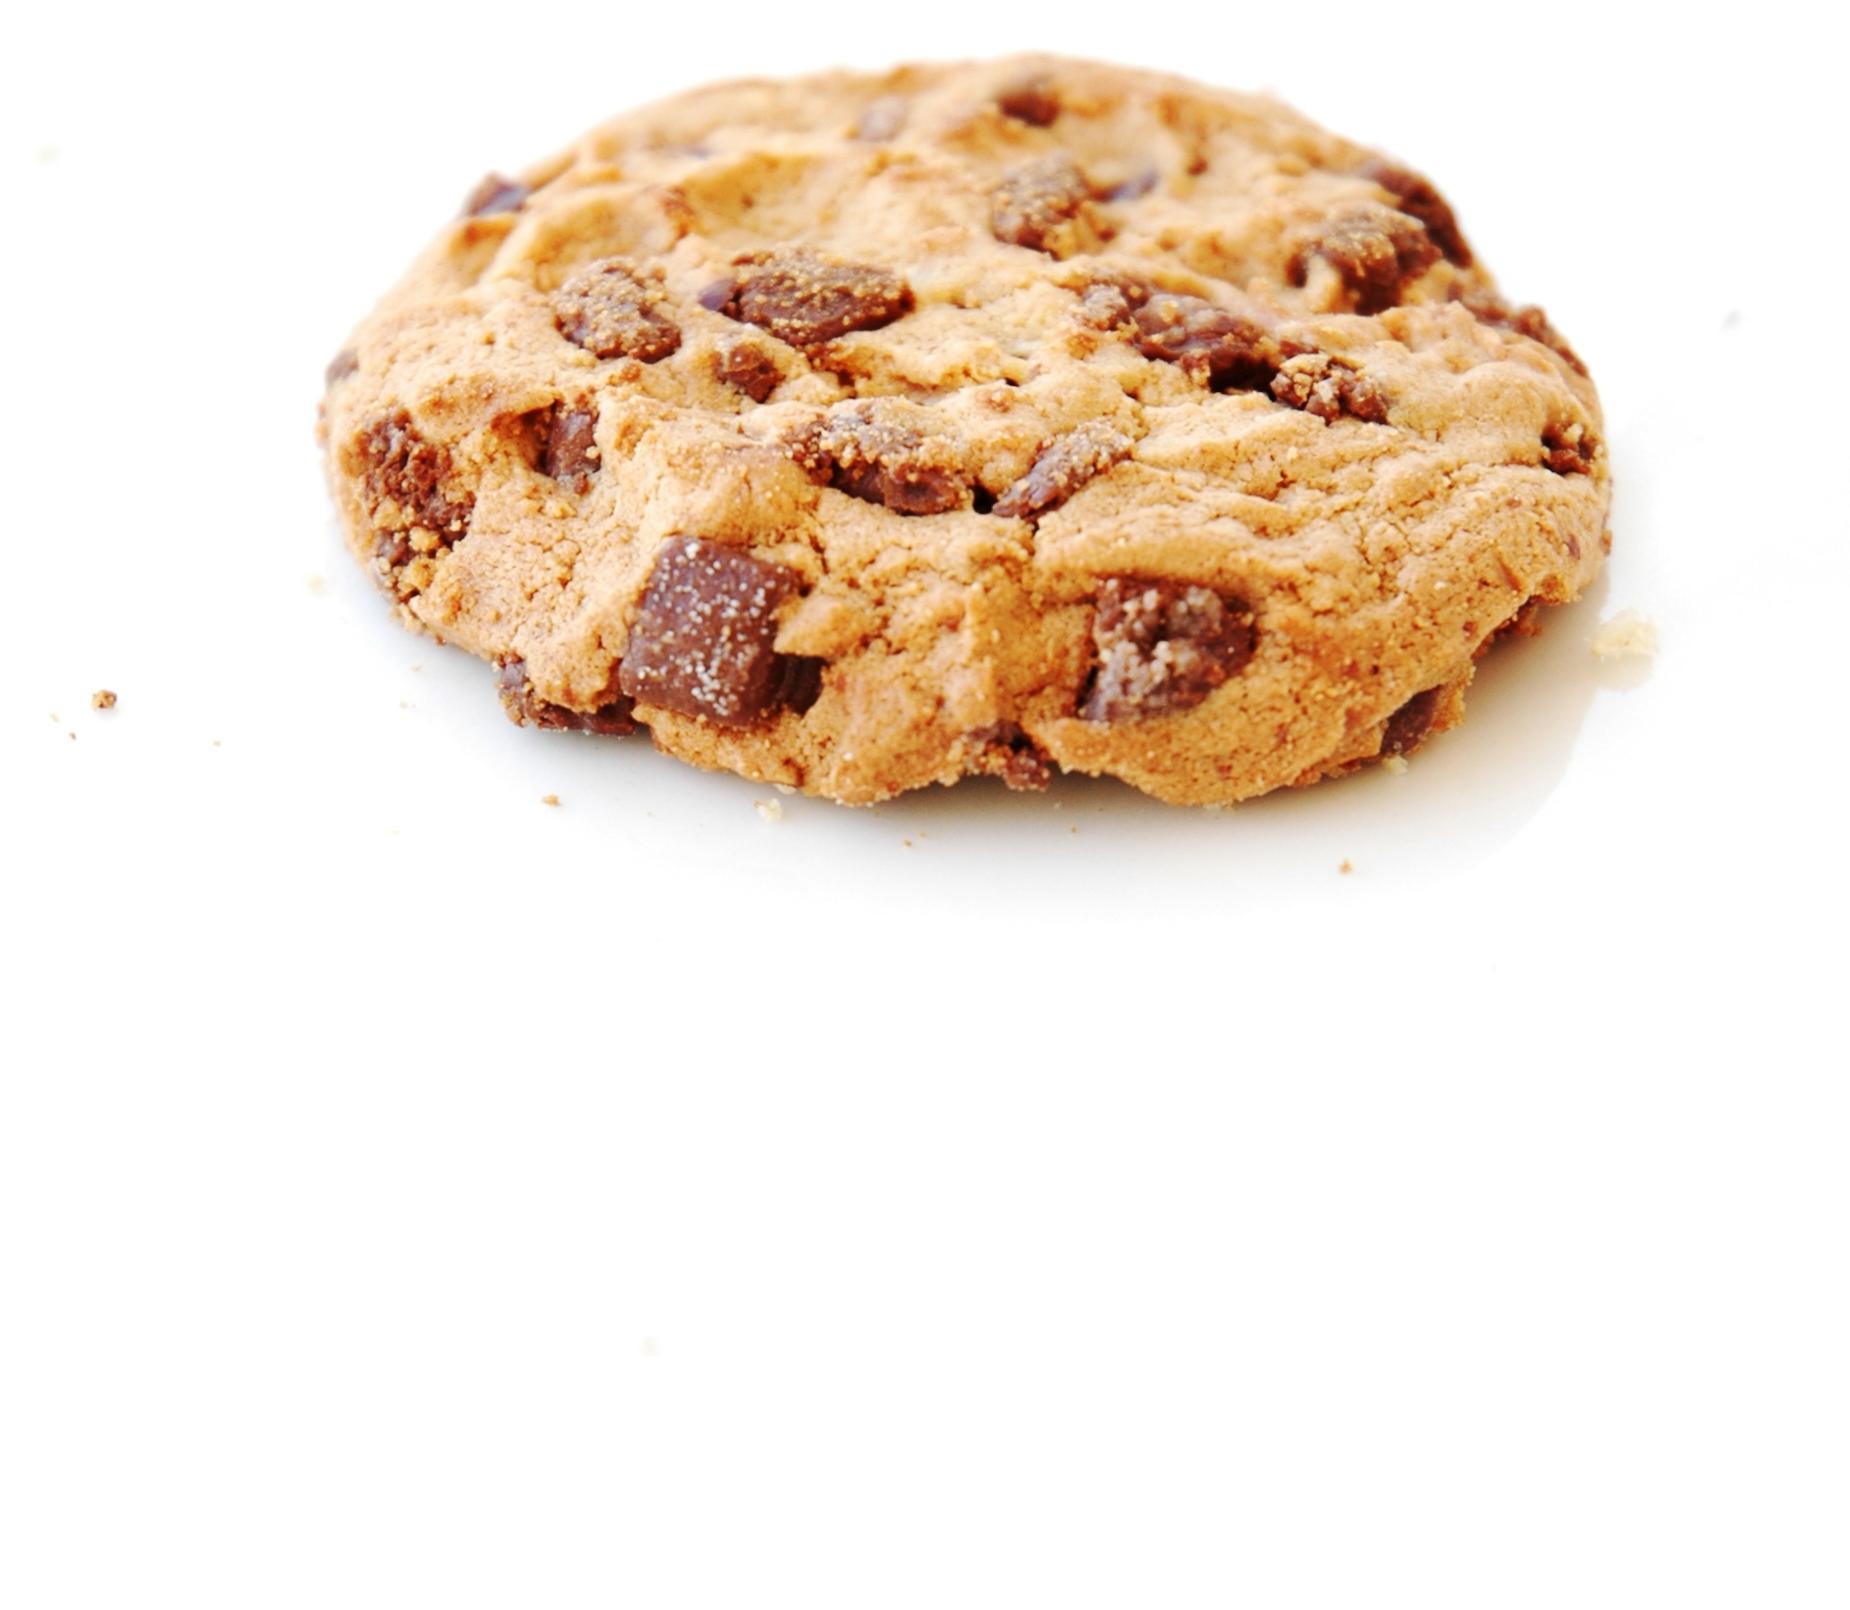 Cookie for breakfast